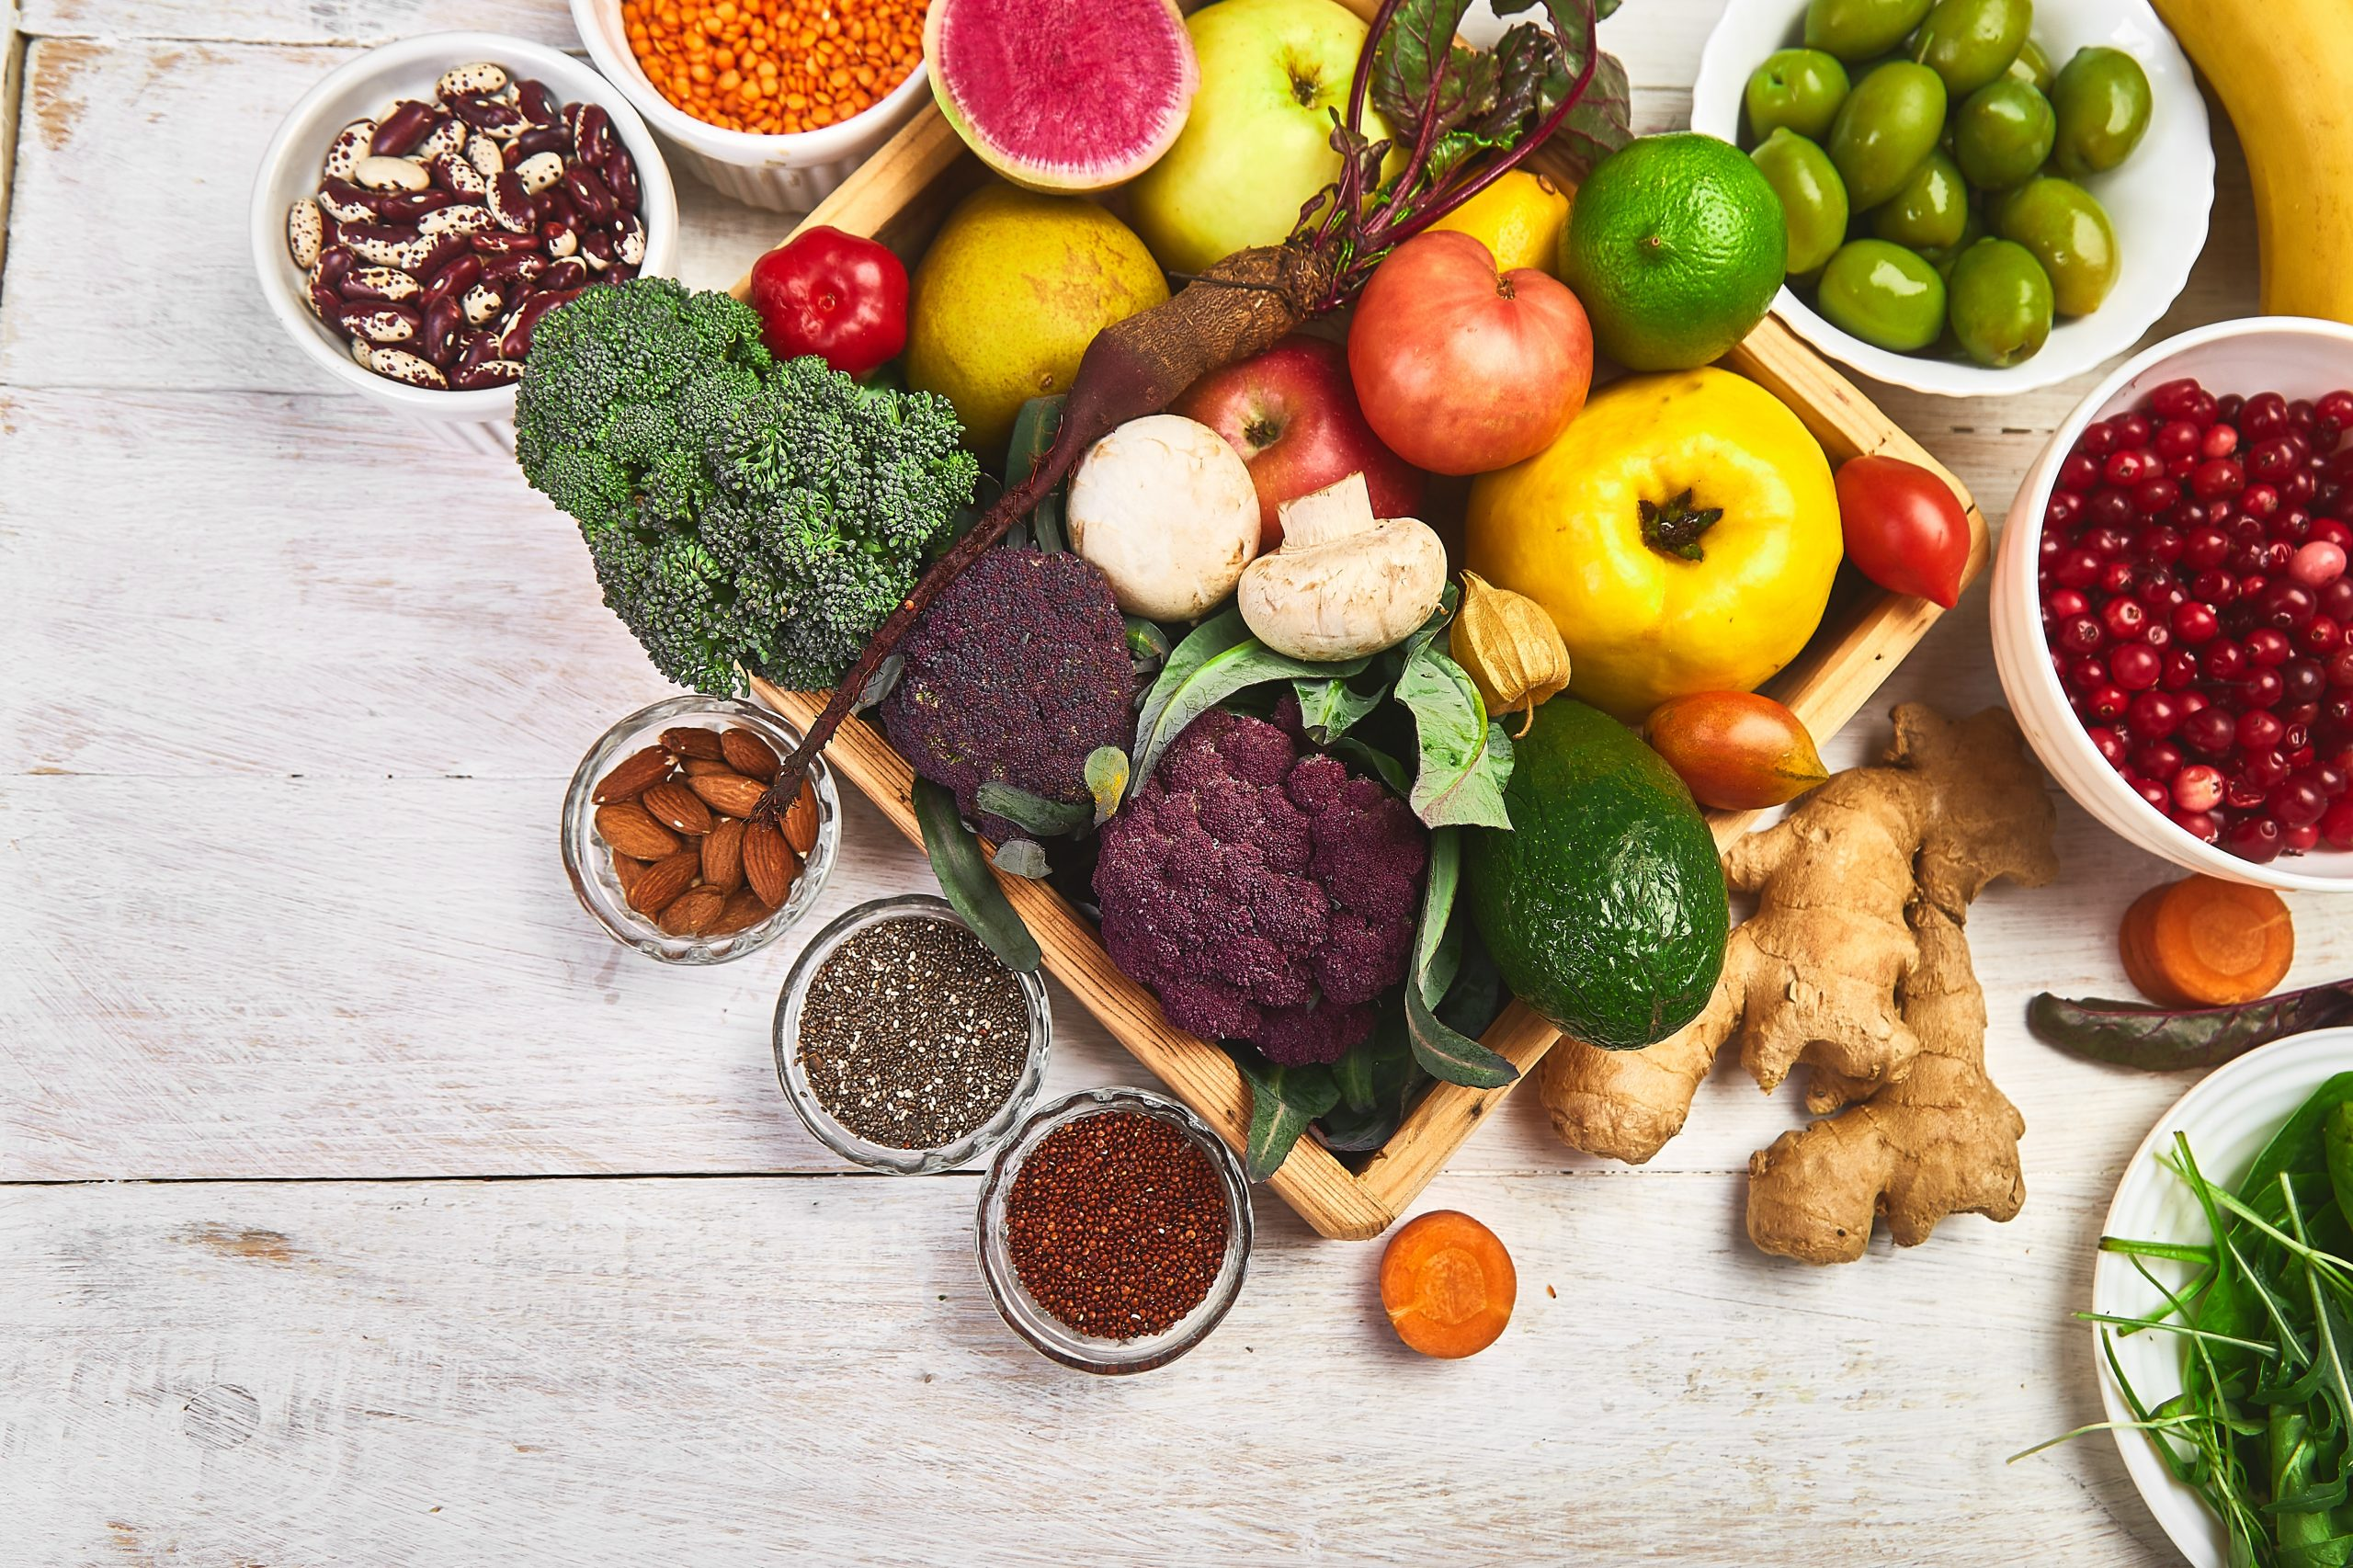 healthy-balanced-vegan-dieting-concept-ingredients-QVJNCBZ-scaled.jpg